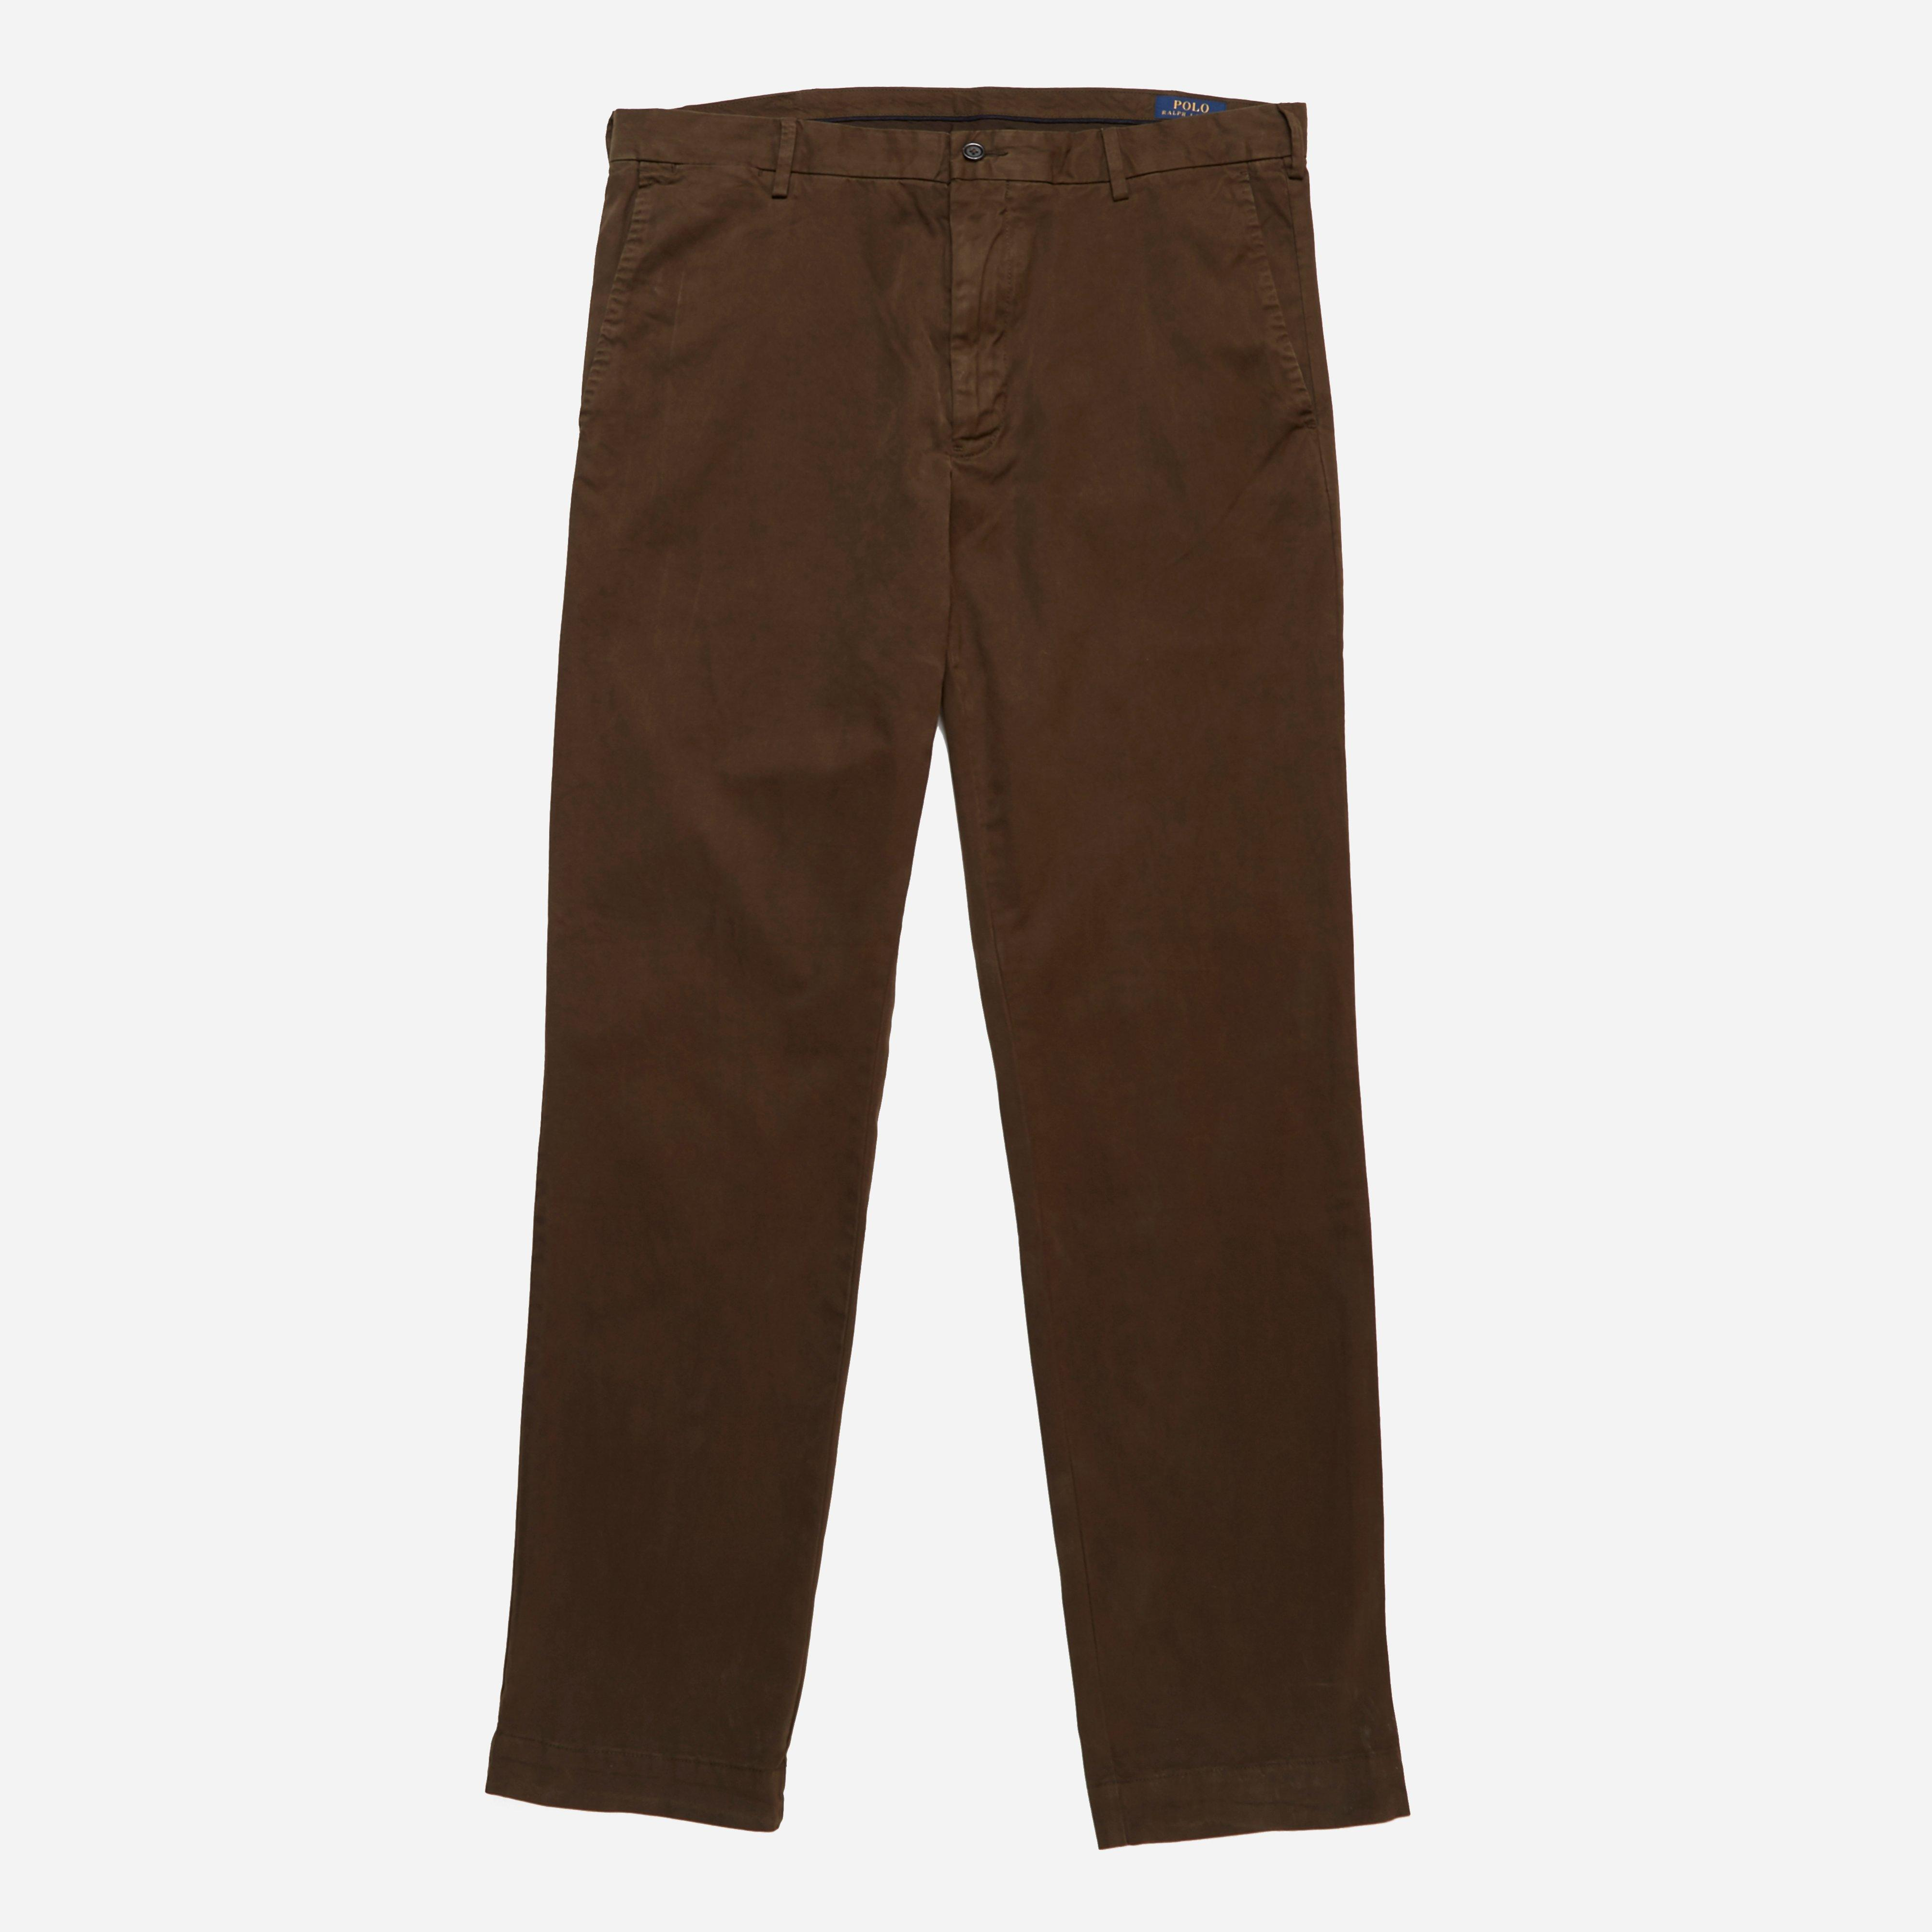 Polo Ralph Lauren Newport Pant